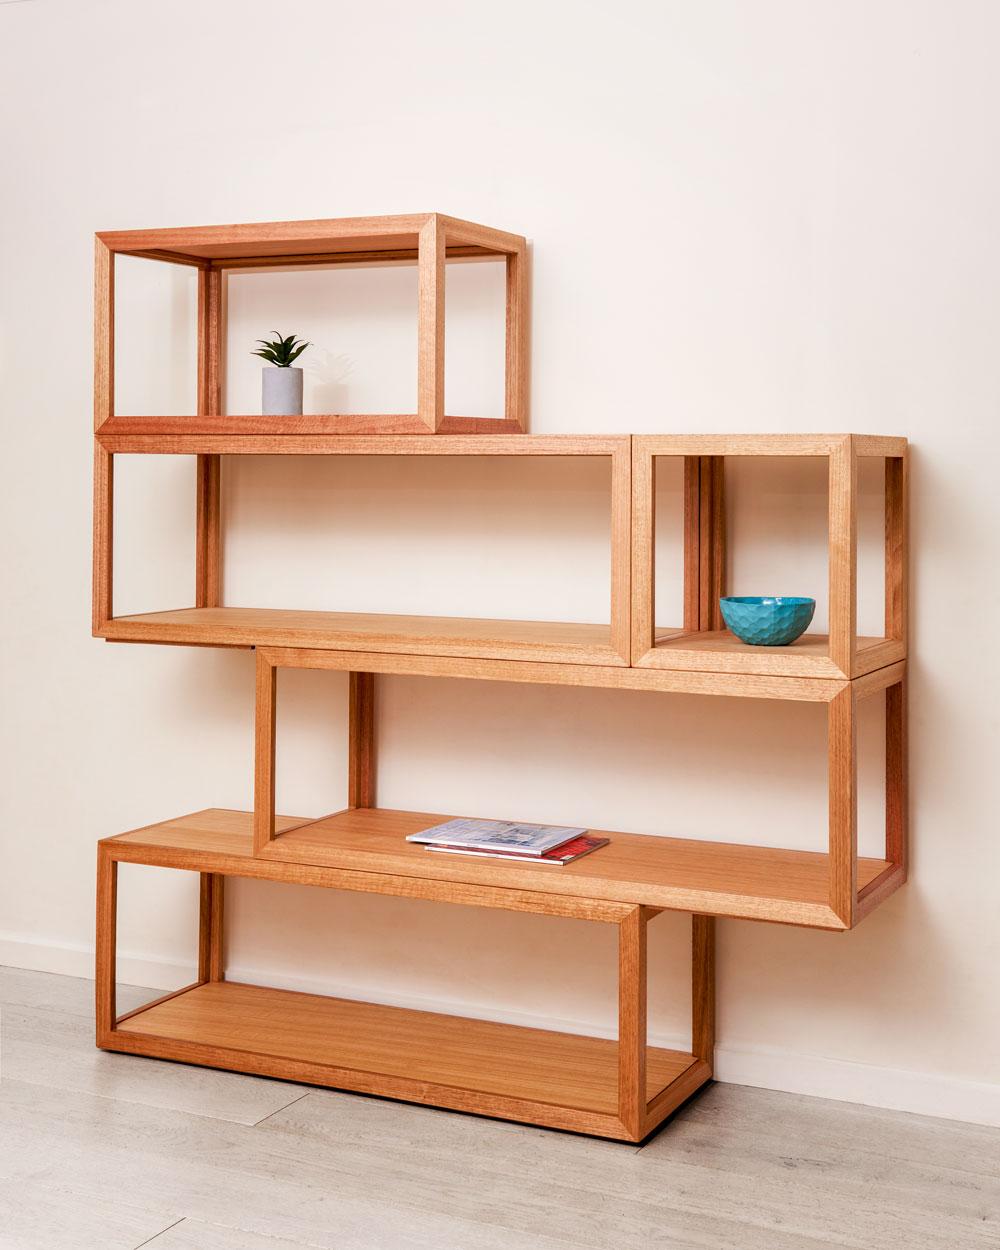 Cubis Shelf System - multiple combinations